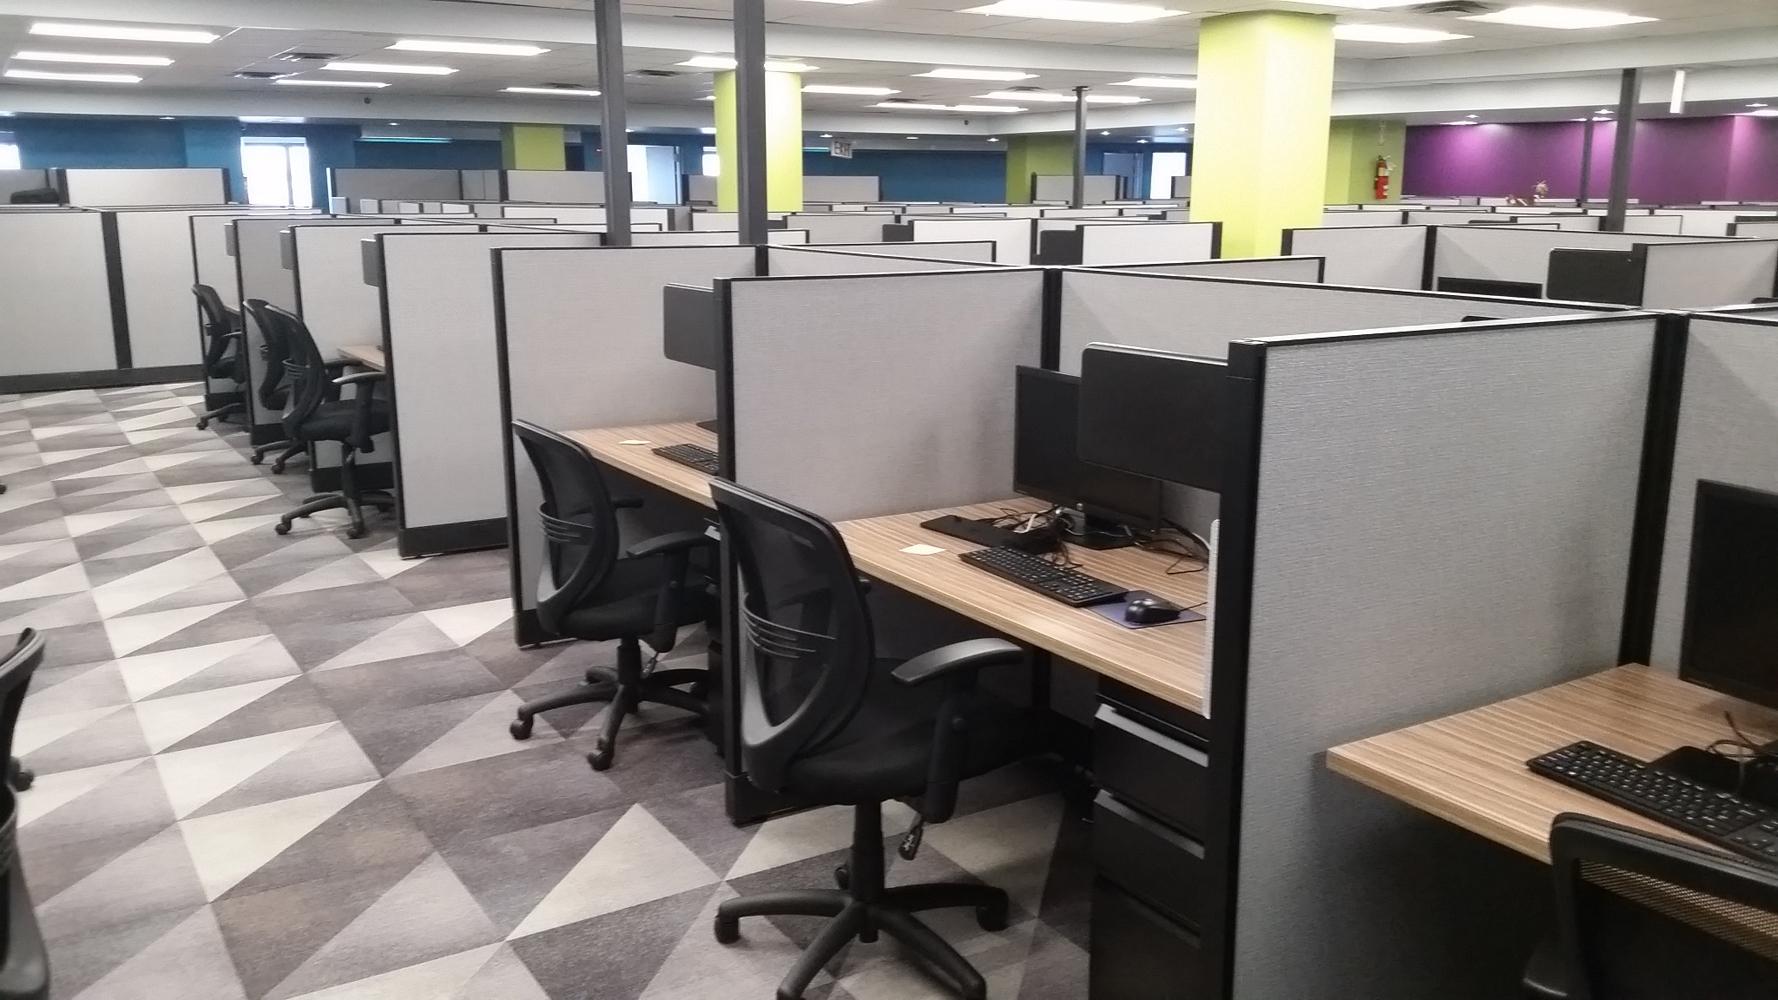 Office design furniture installation in jamaica queens ny